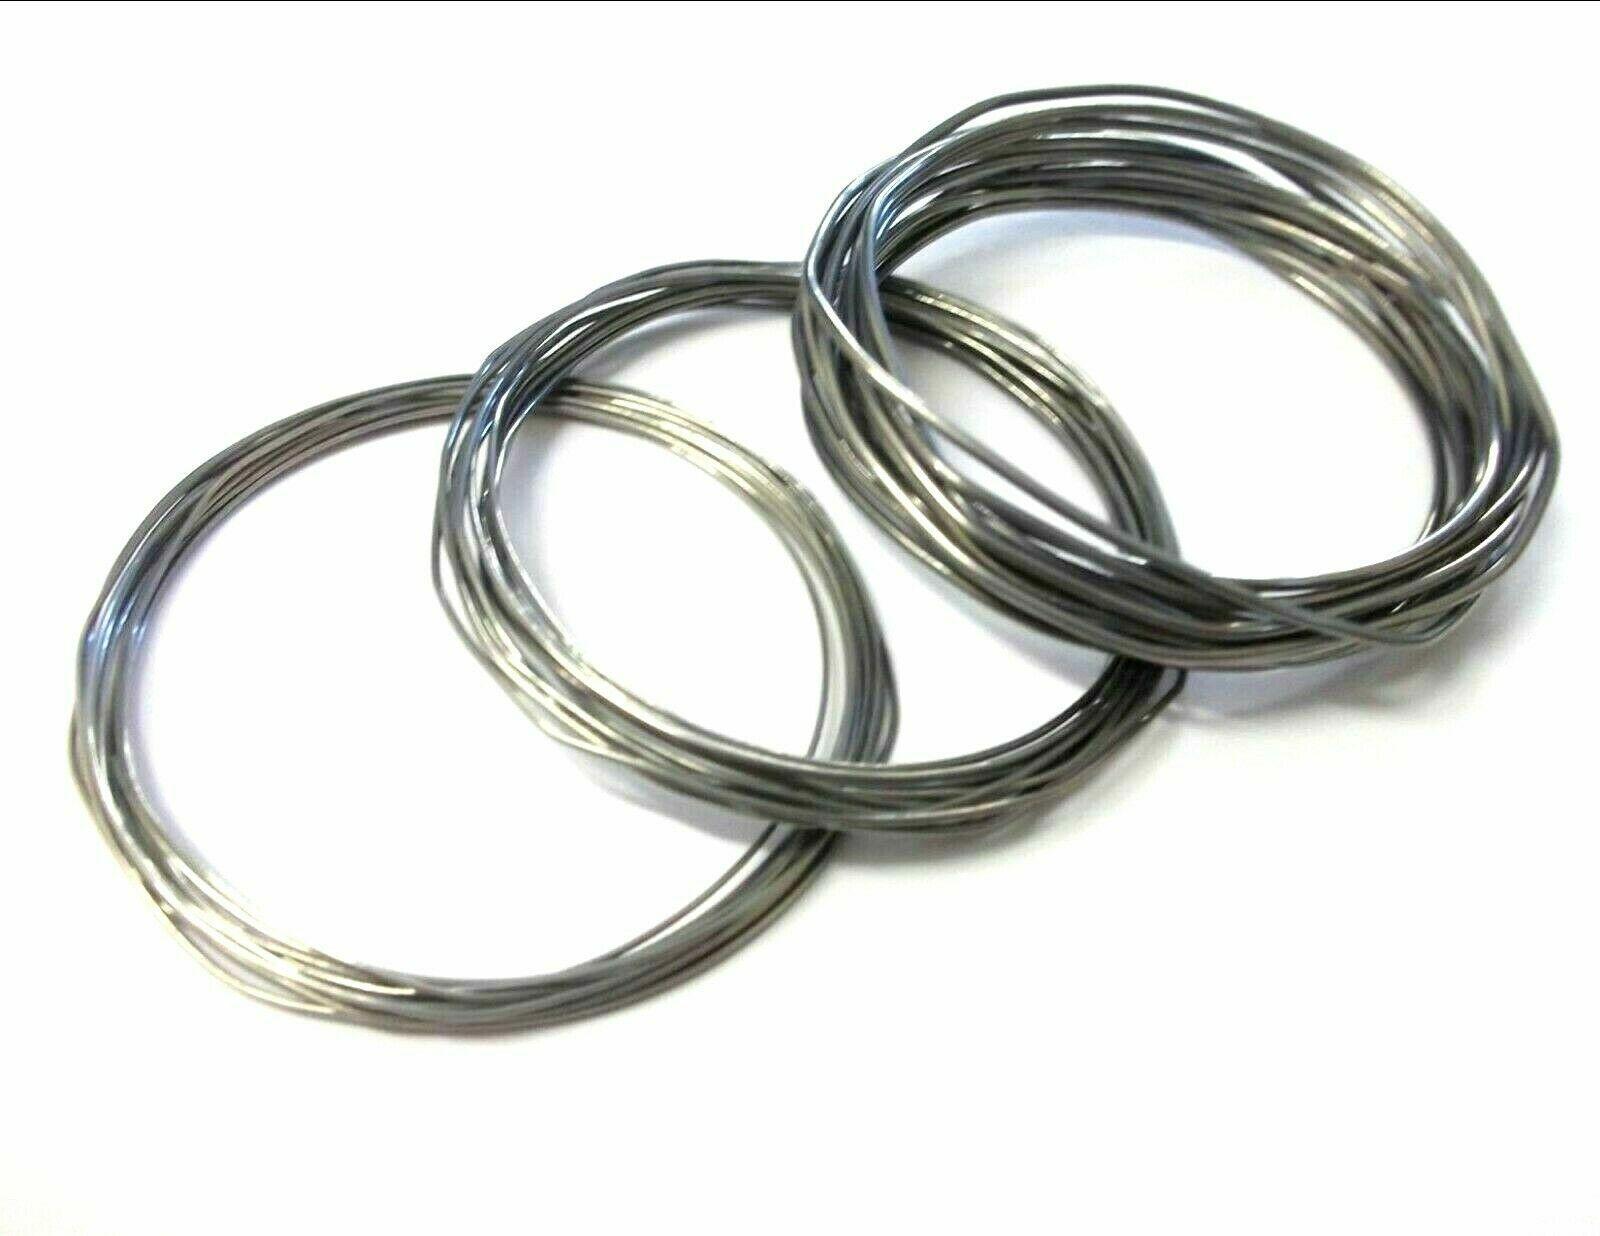 3m Fine low melting point solder wire SN62 179C 0.7mm